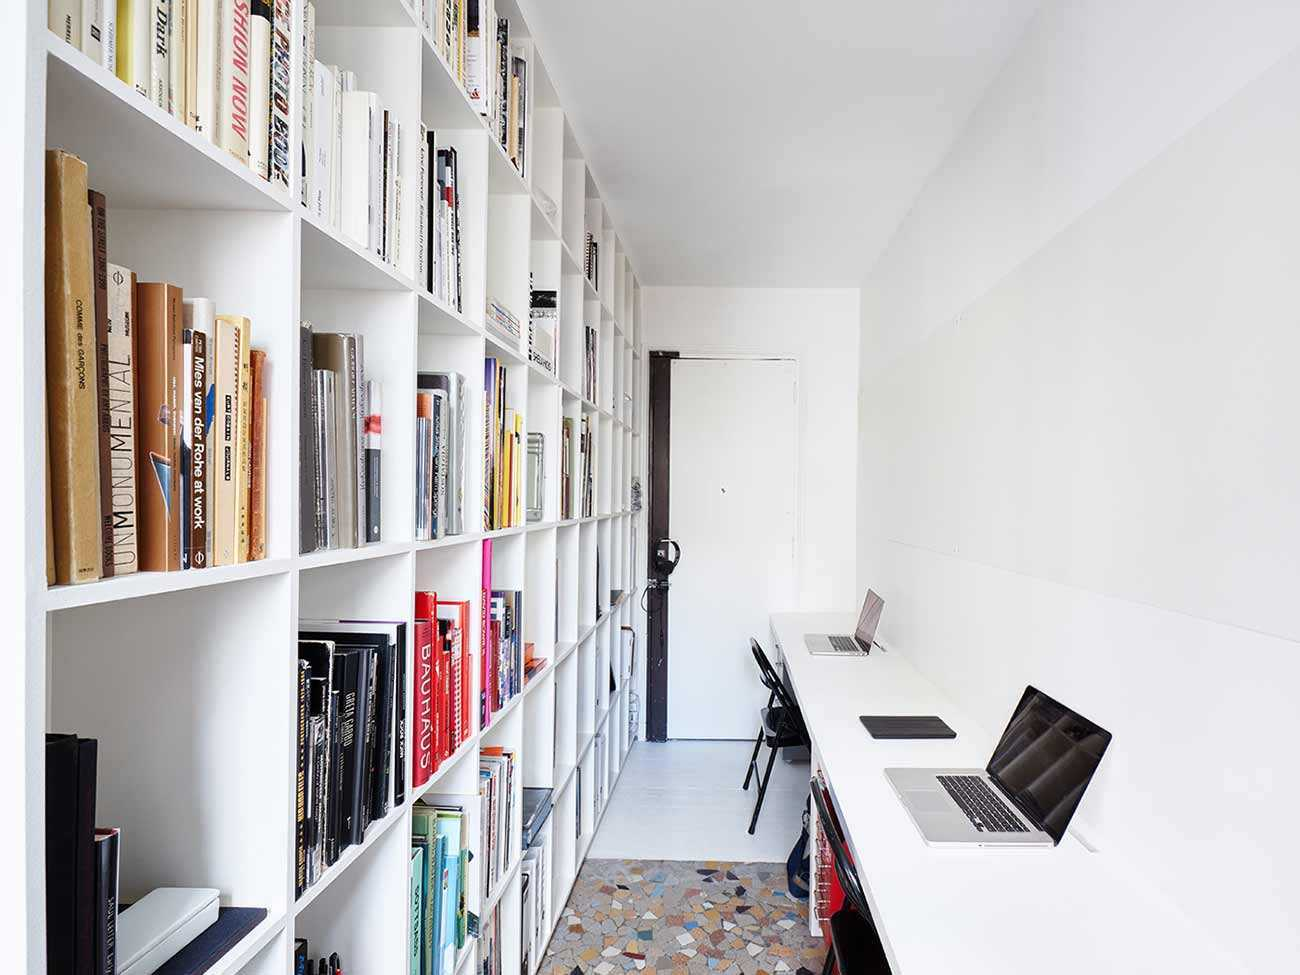 Desain rak dinding apartemen minimalis karya Septembre Architecture via organized-home.com